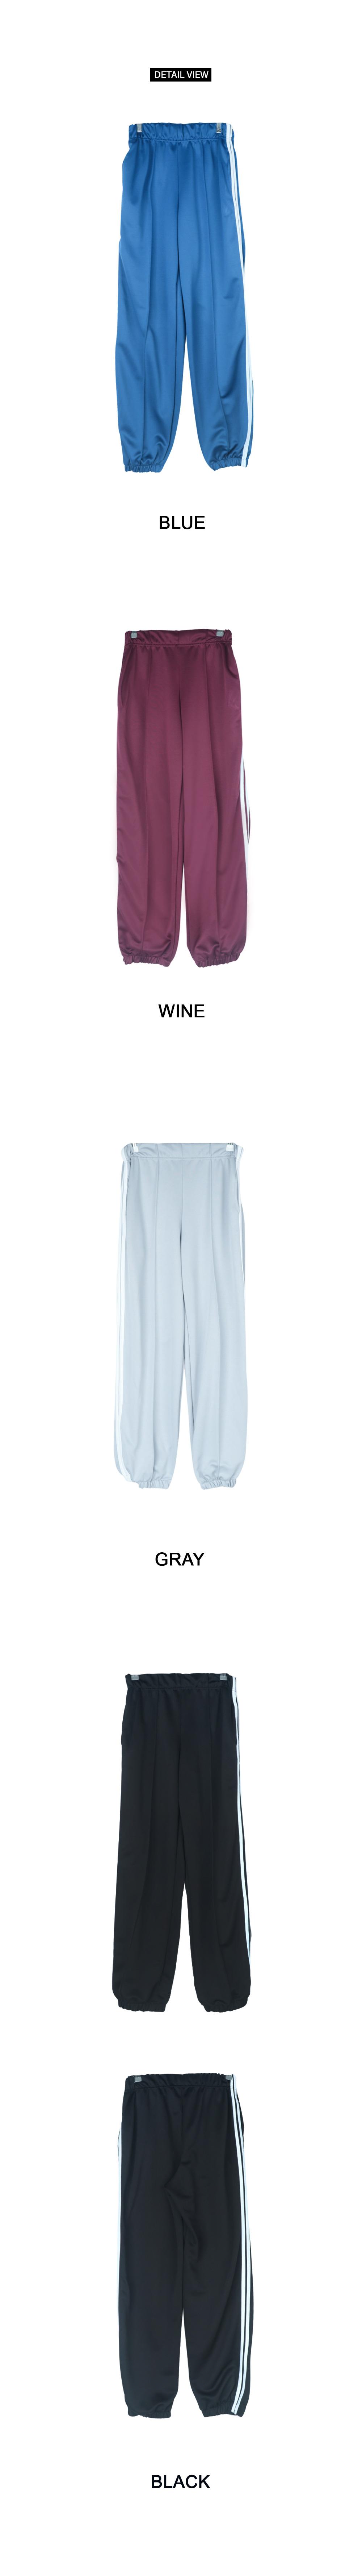 Regular Line Jogger Pants